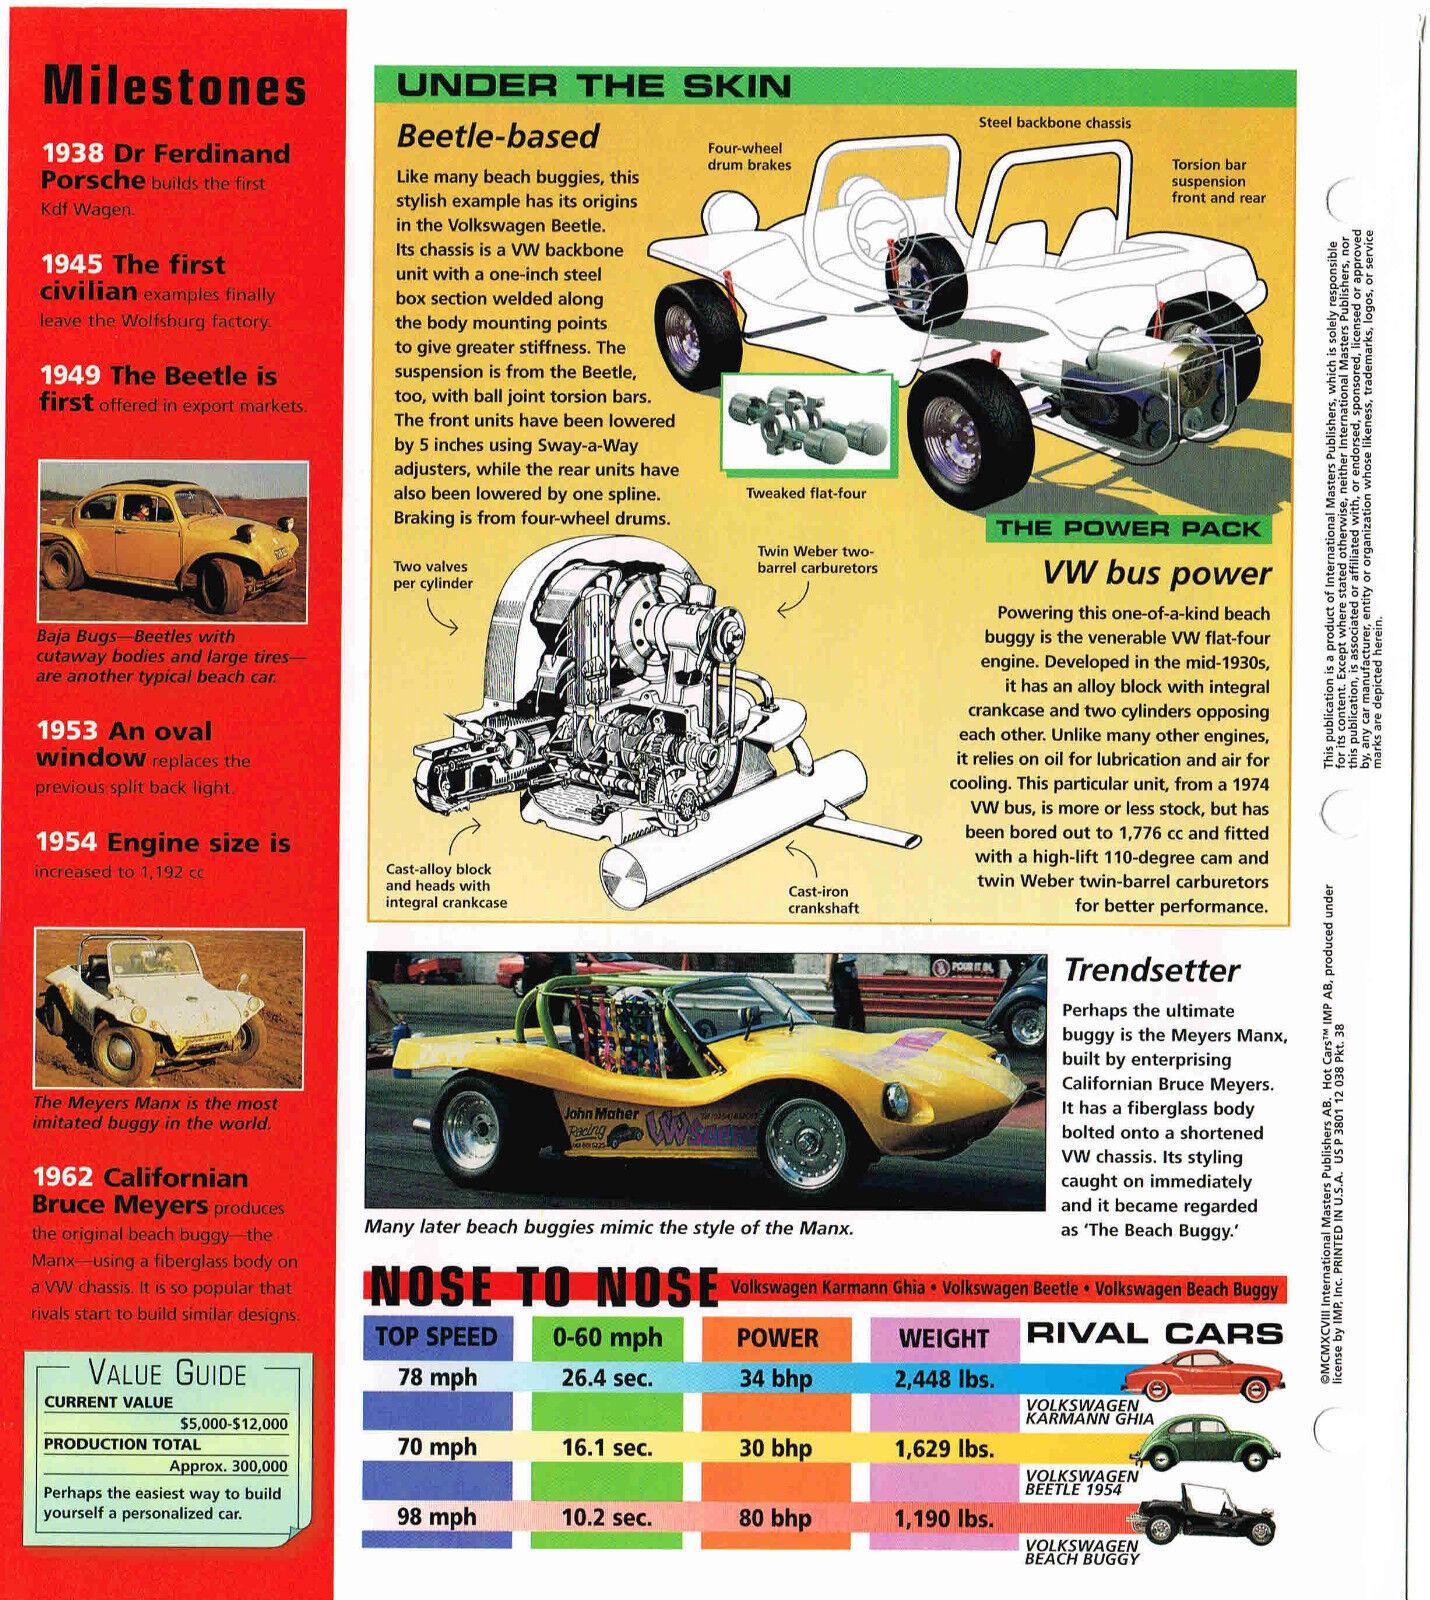 1967 VW DUNE BEACH BUGGY SPEC SHEET/Brochure: HUSTLER - EUR 11,46   PicClick DE